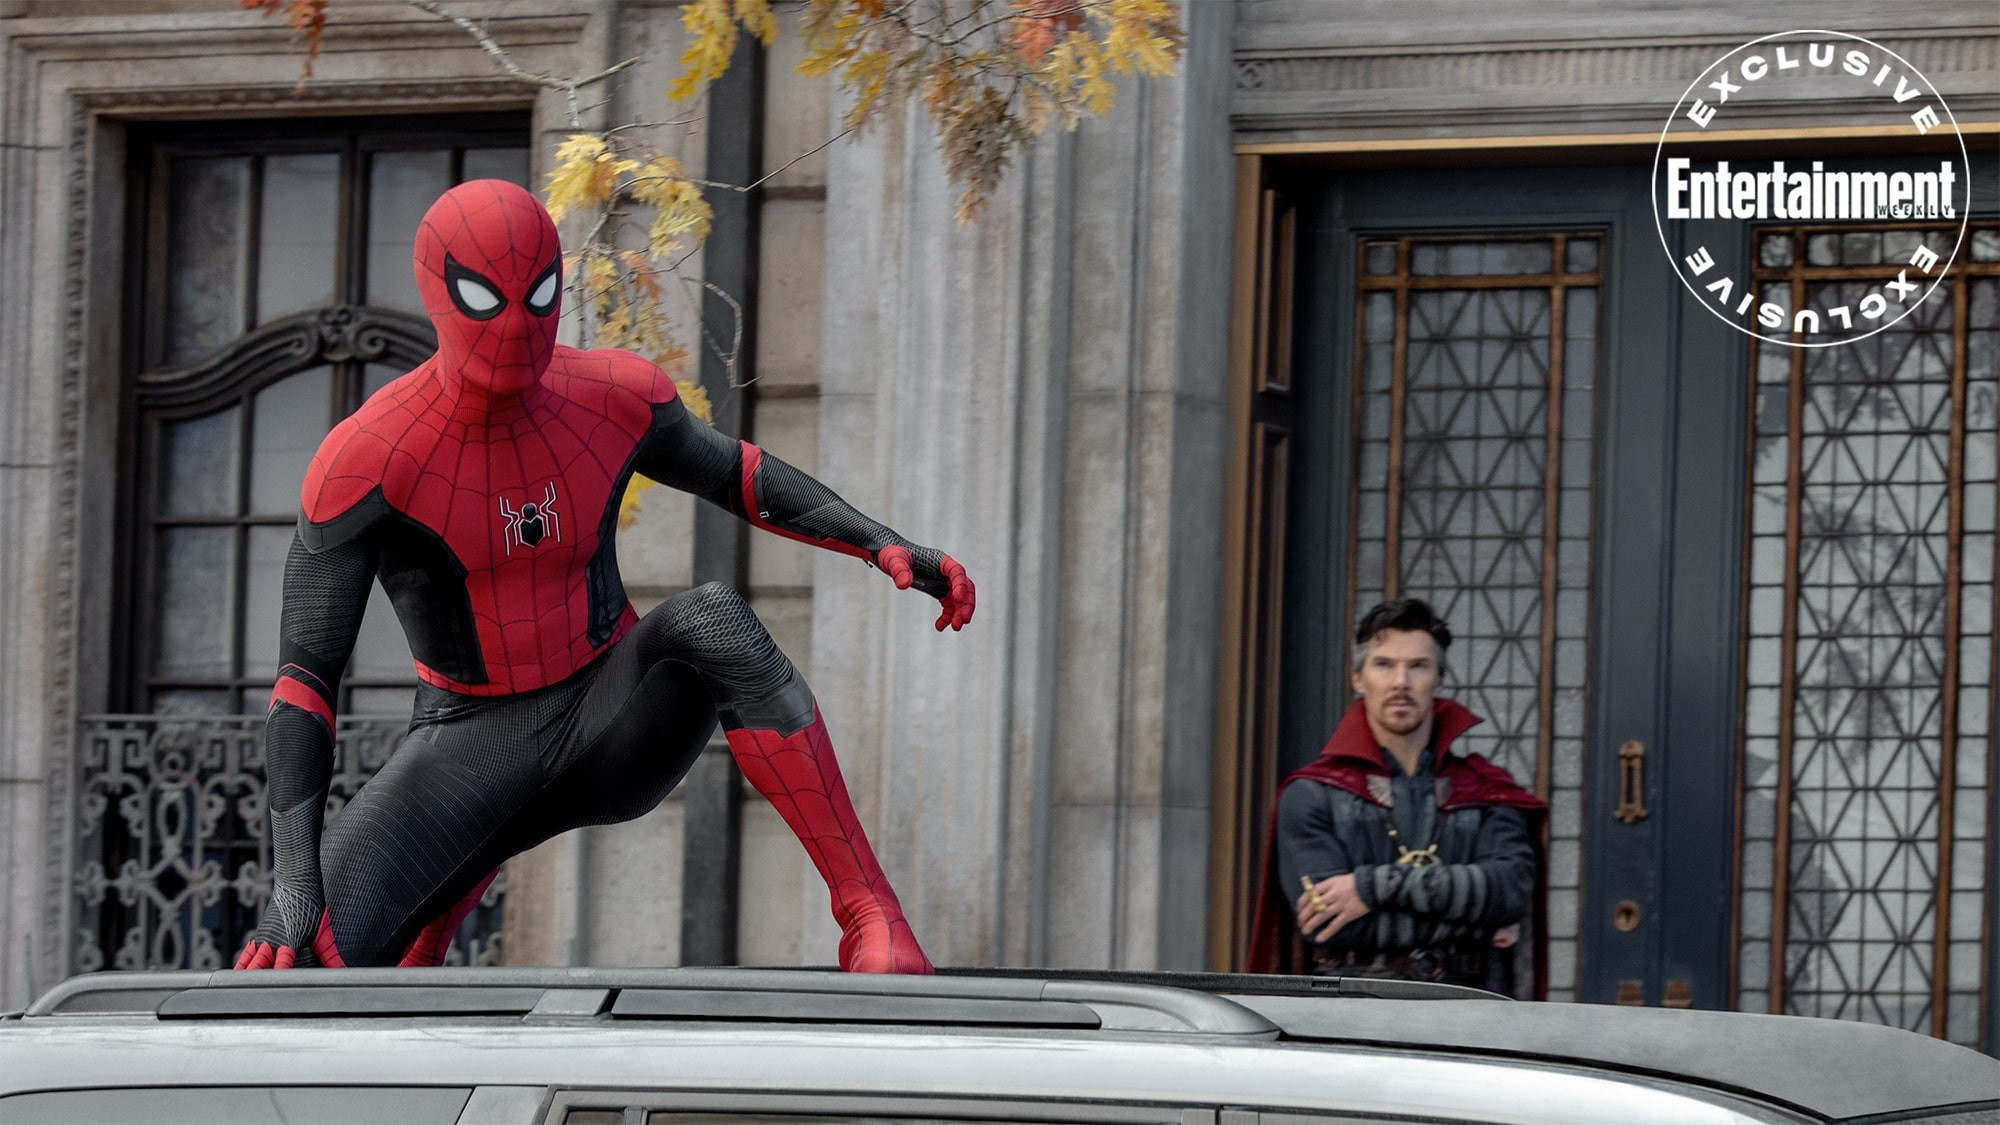 spider-man bez drogi do domu Tom Holland jako Spider-Man i Benedict Cumberbatch jako Doktor Strange